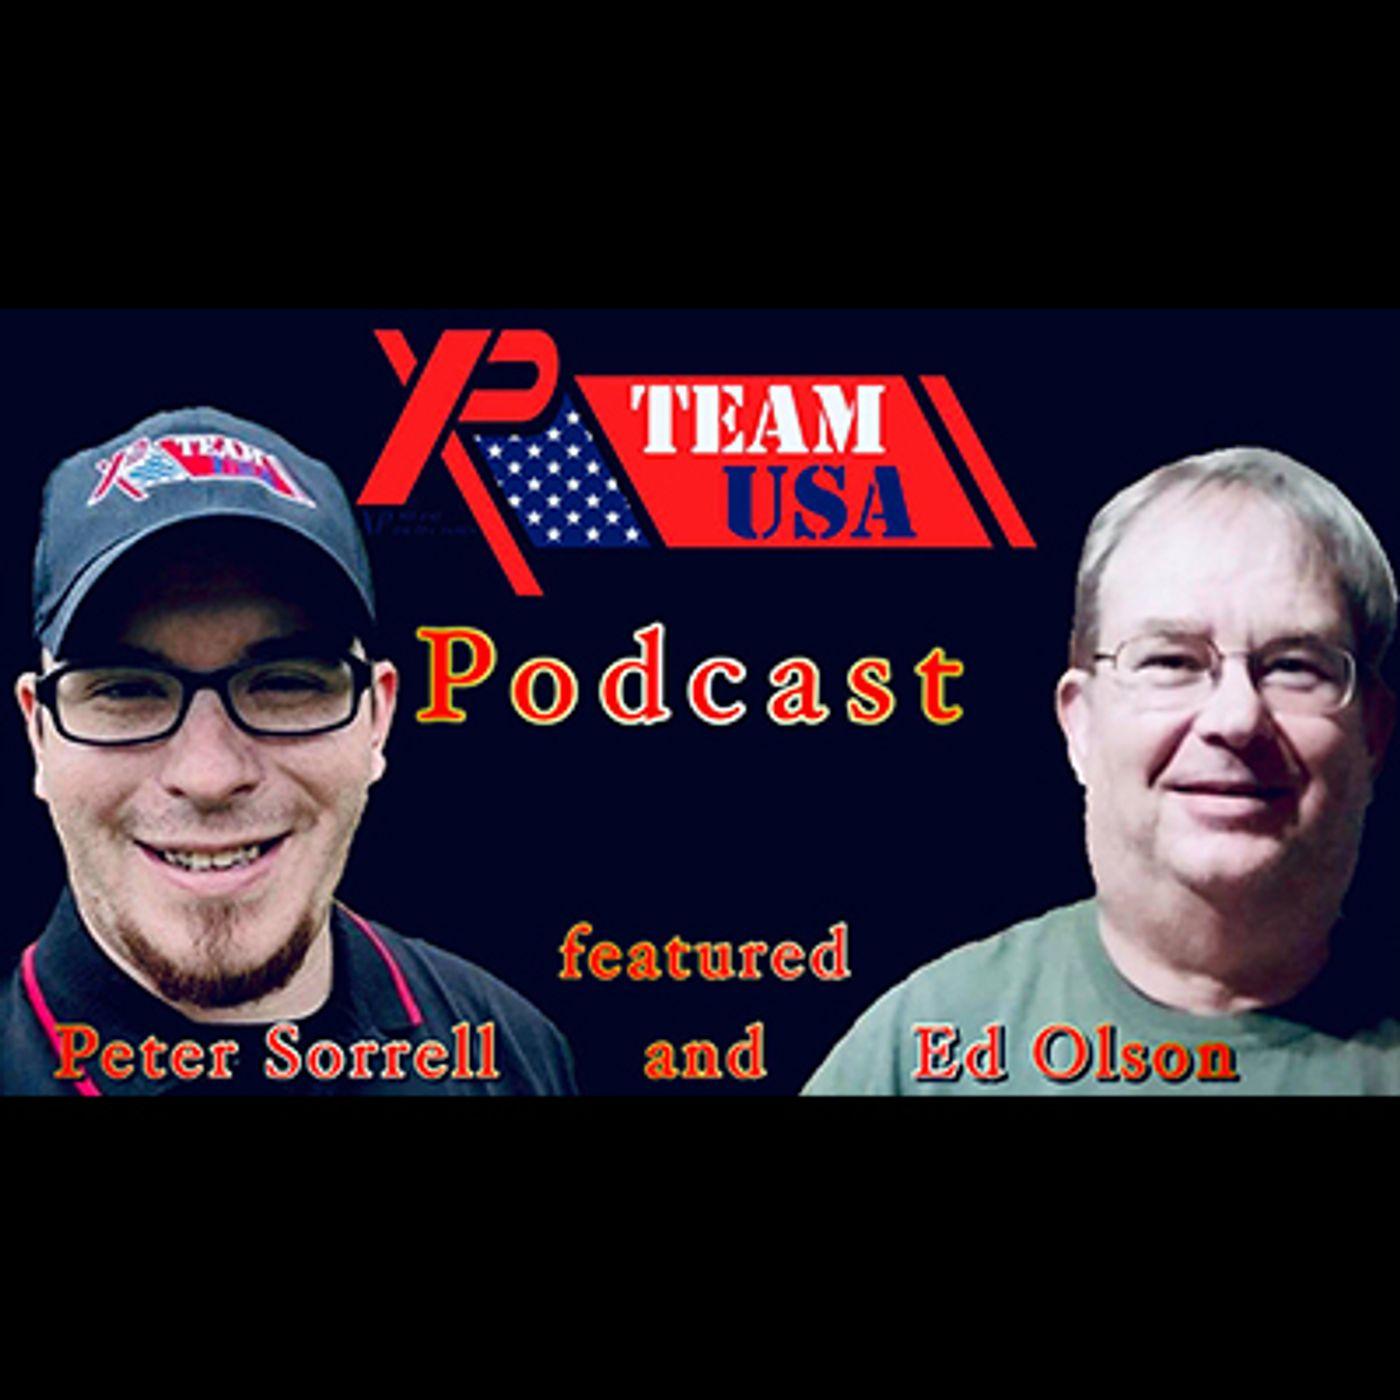 Ed Olson and Peter Sorell